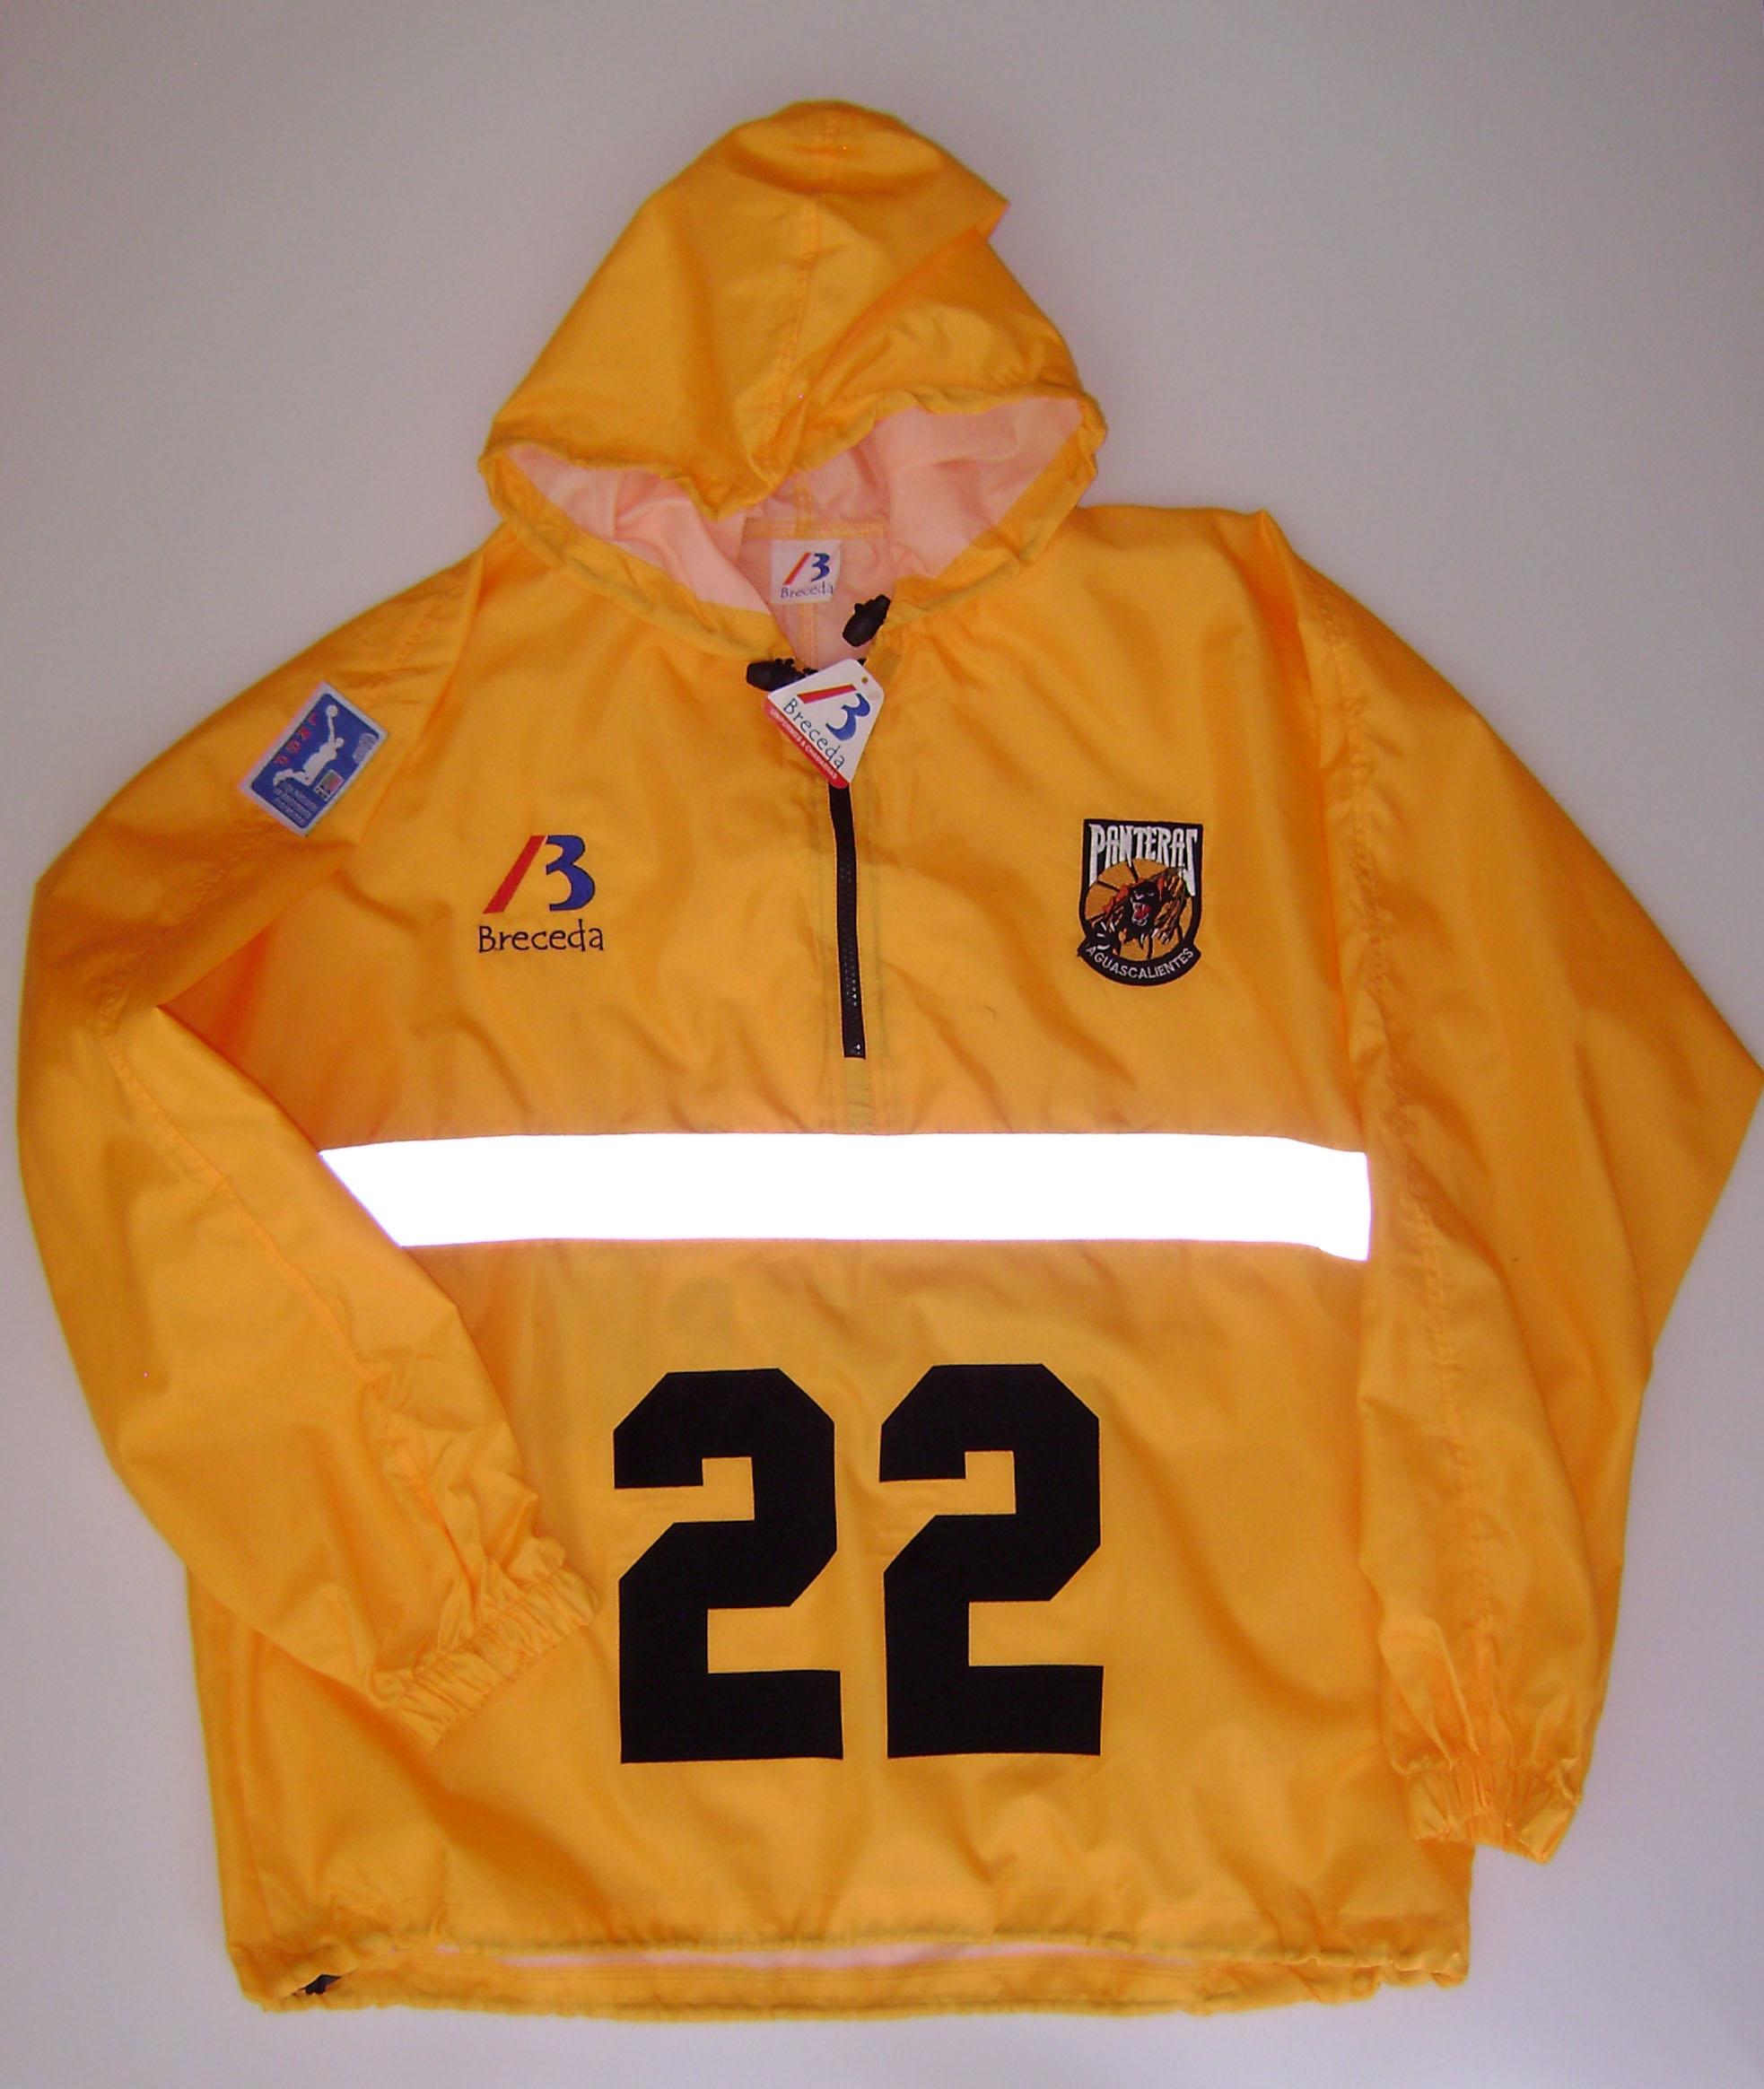 uniformeChamarraRompevientosCapucha1